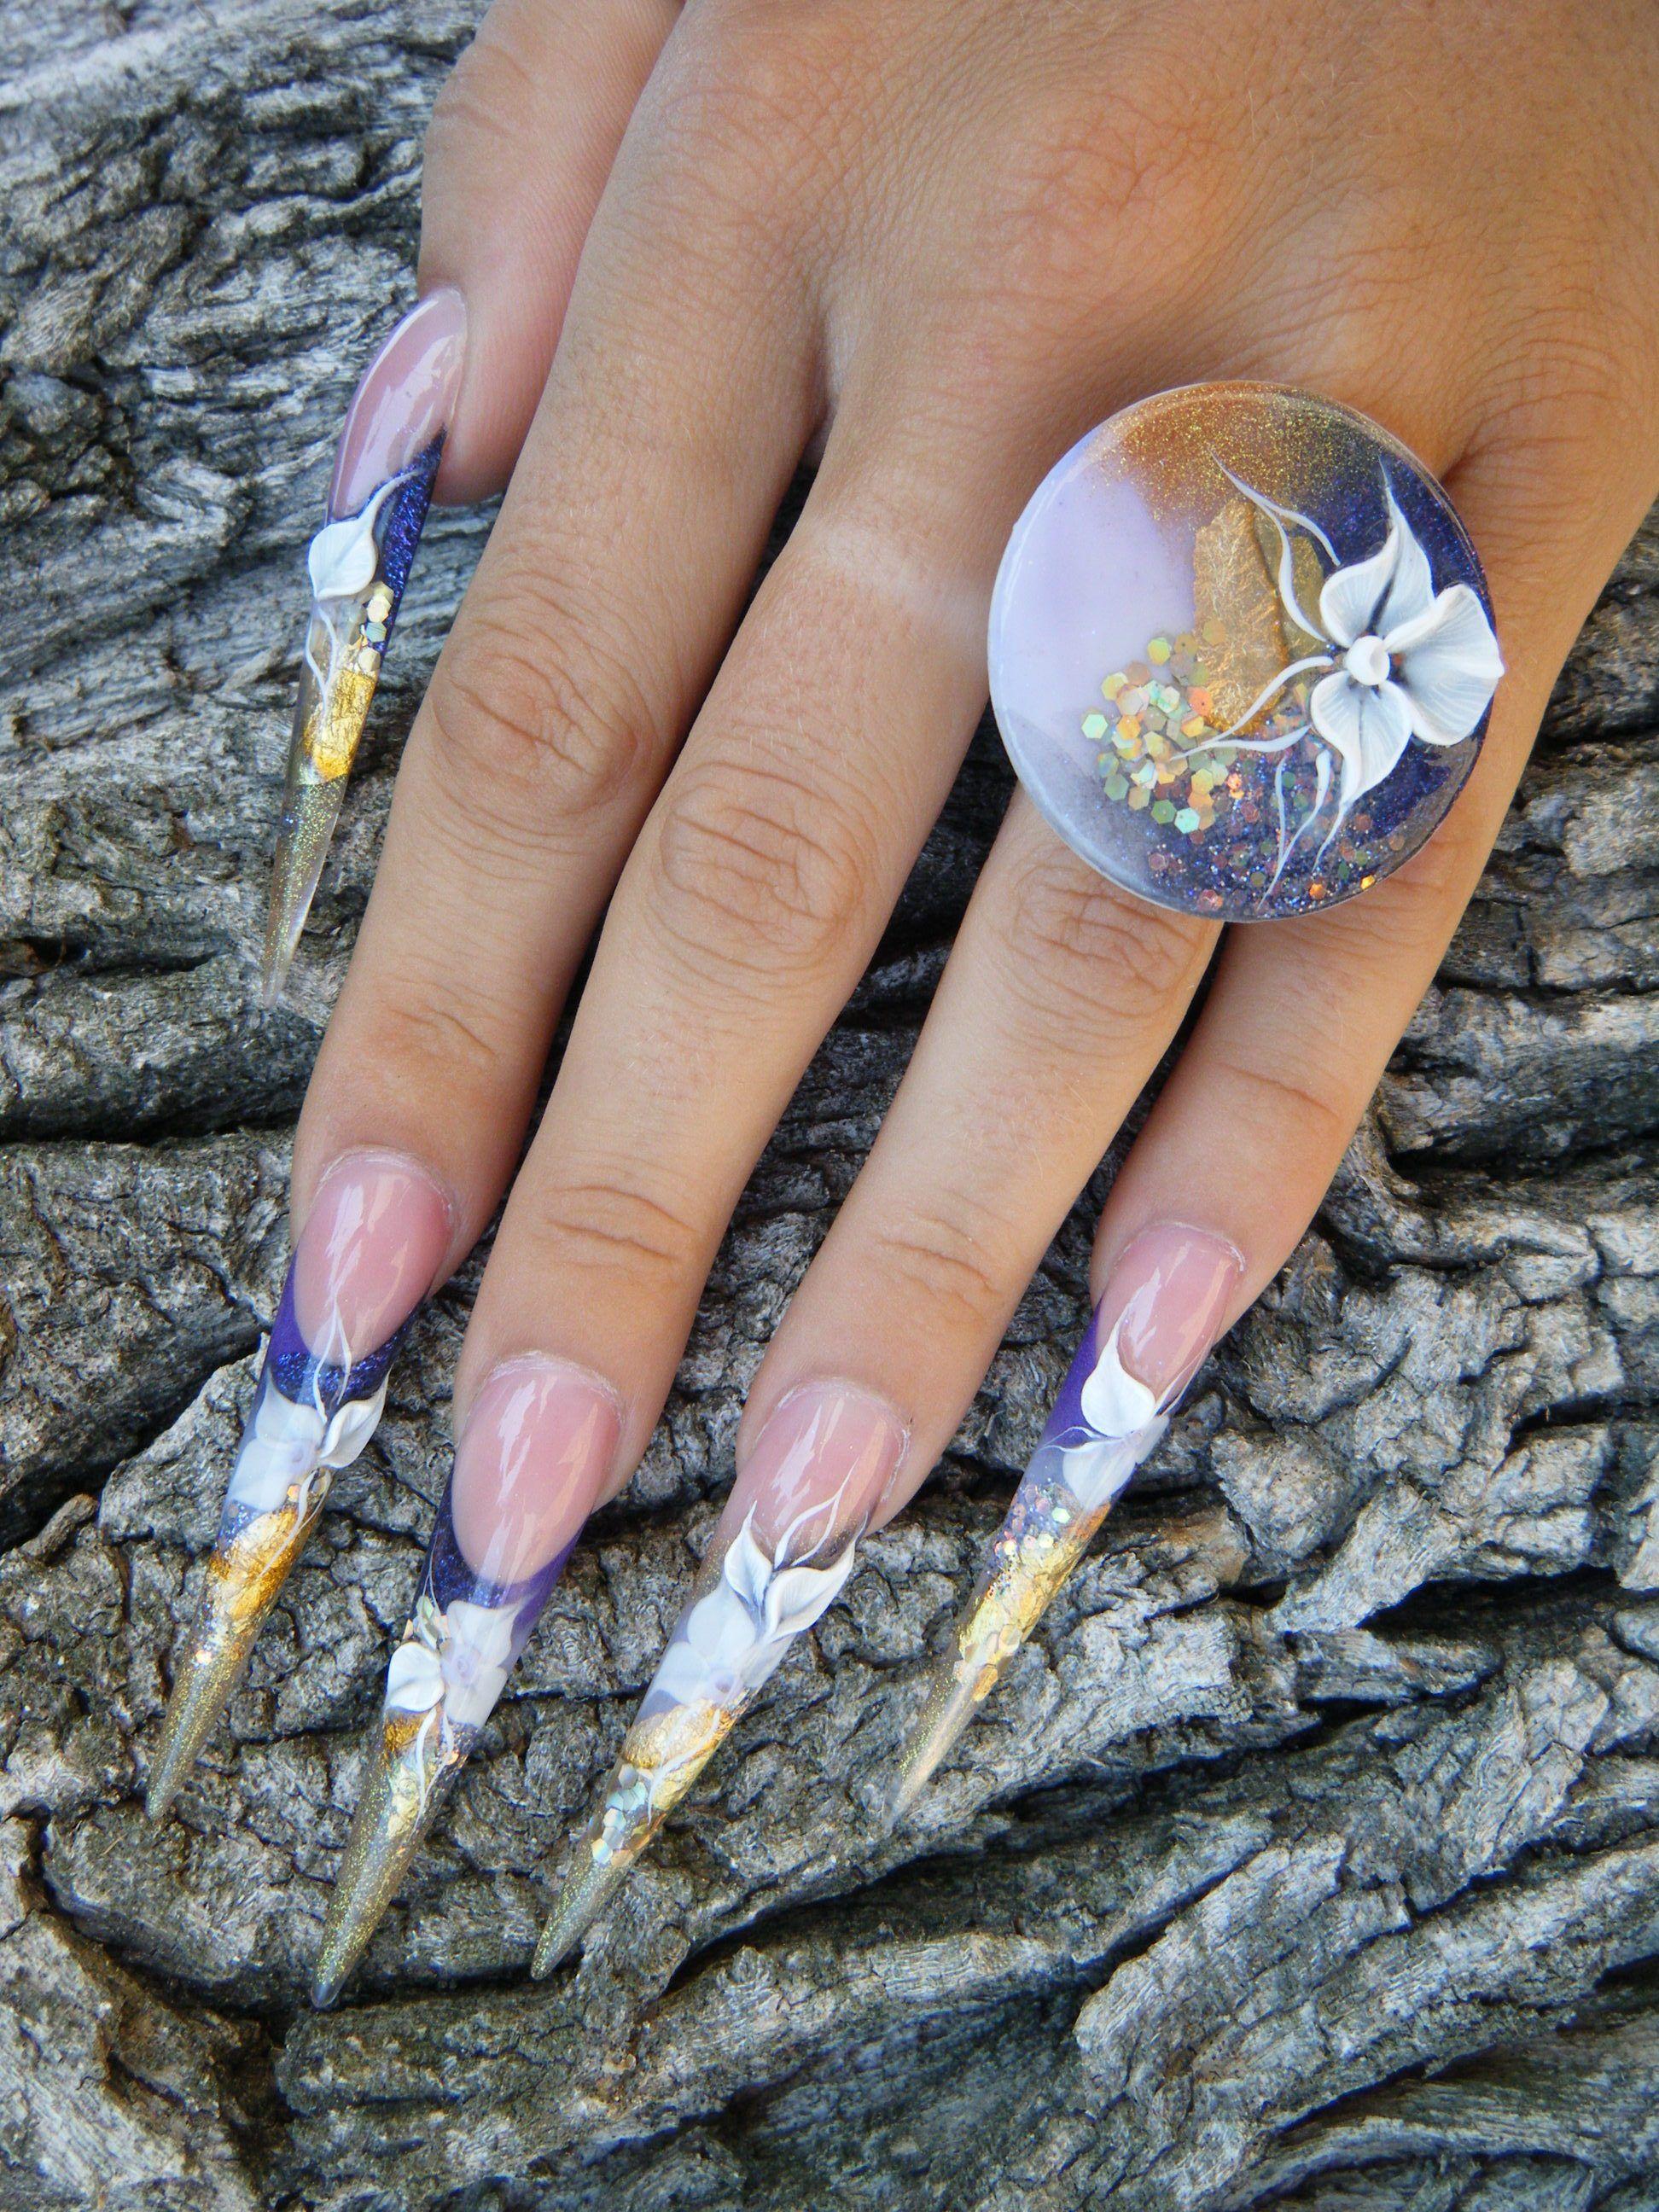 Bemerkenswert Nägel Muster Referenz Von #crystalnails #nägel #nagelstudio #nailart #muster #gelnägel #babyboomer